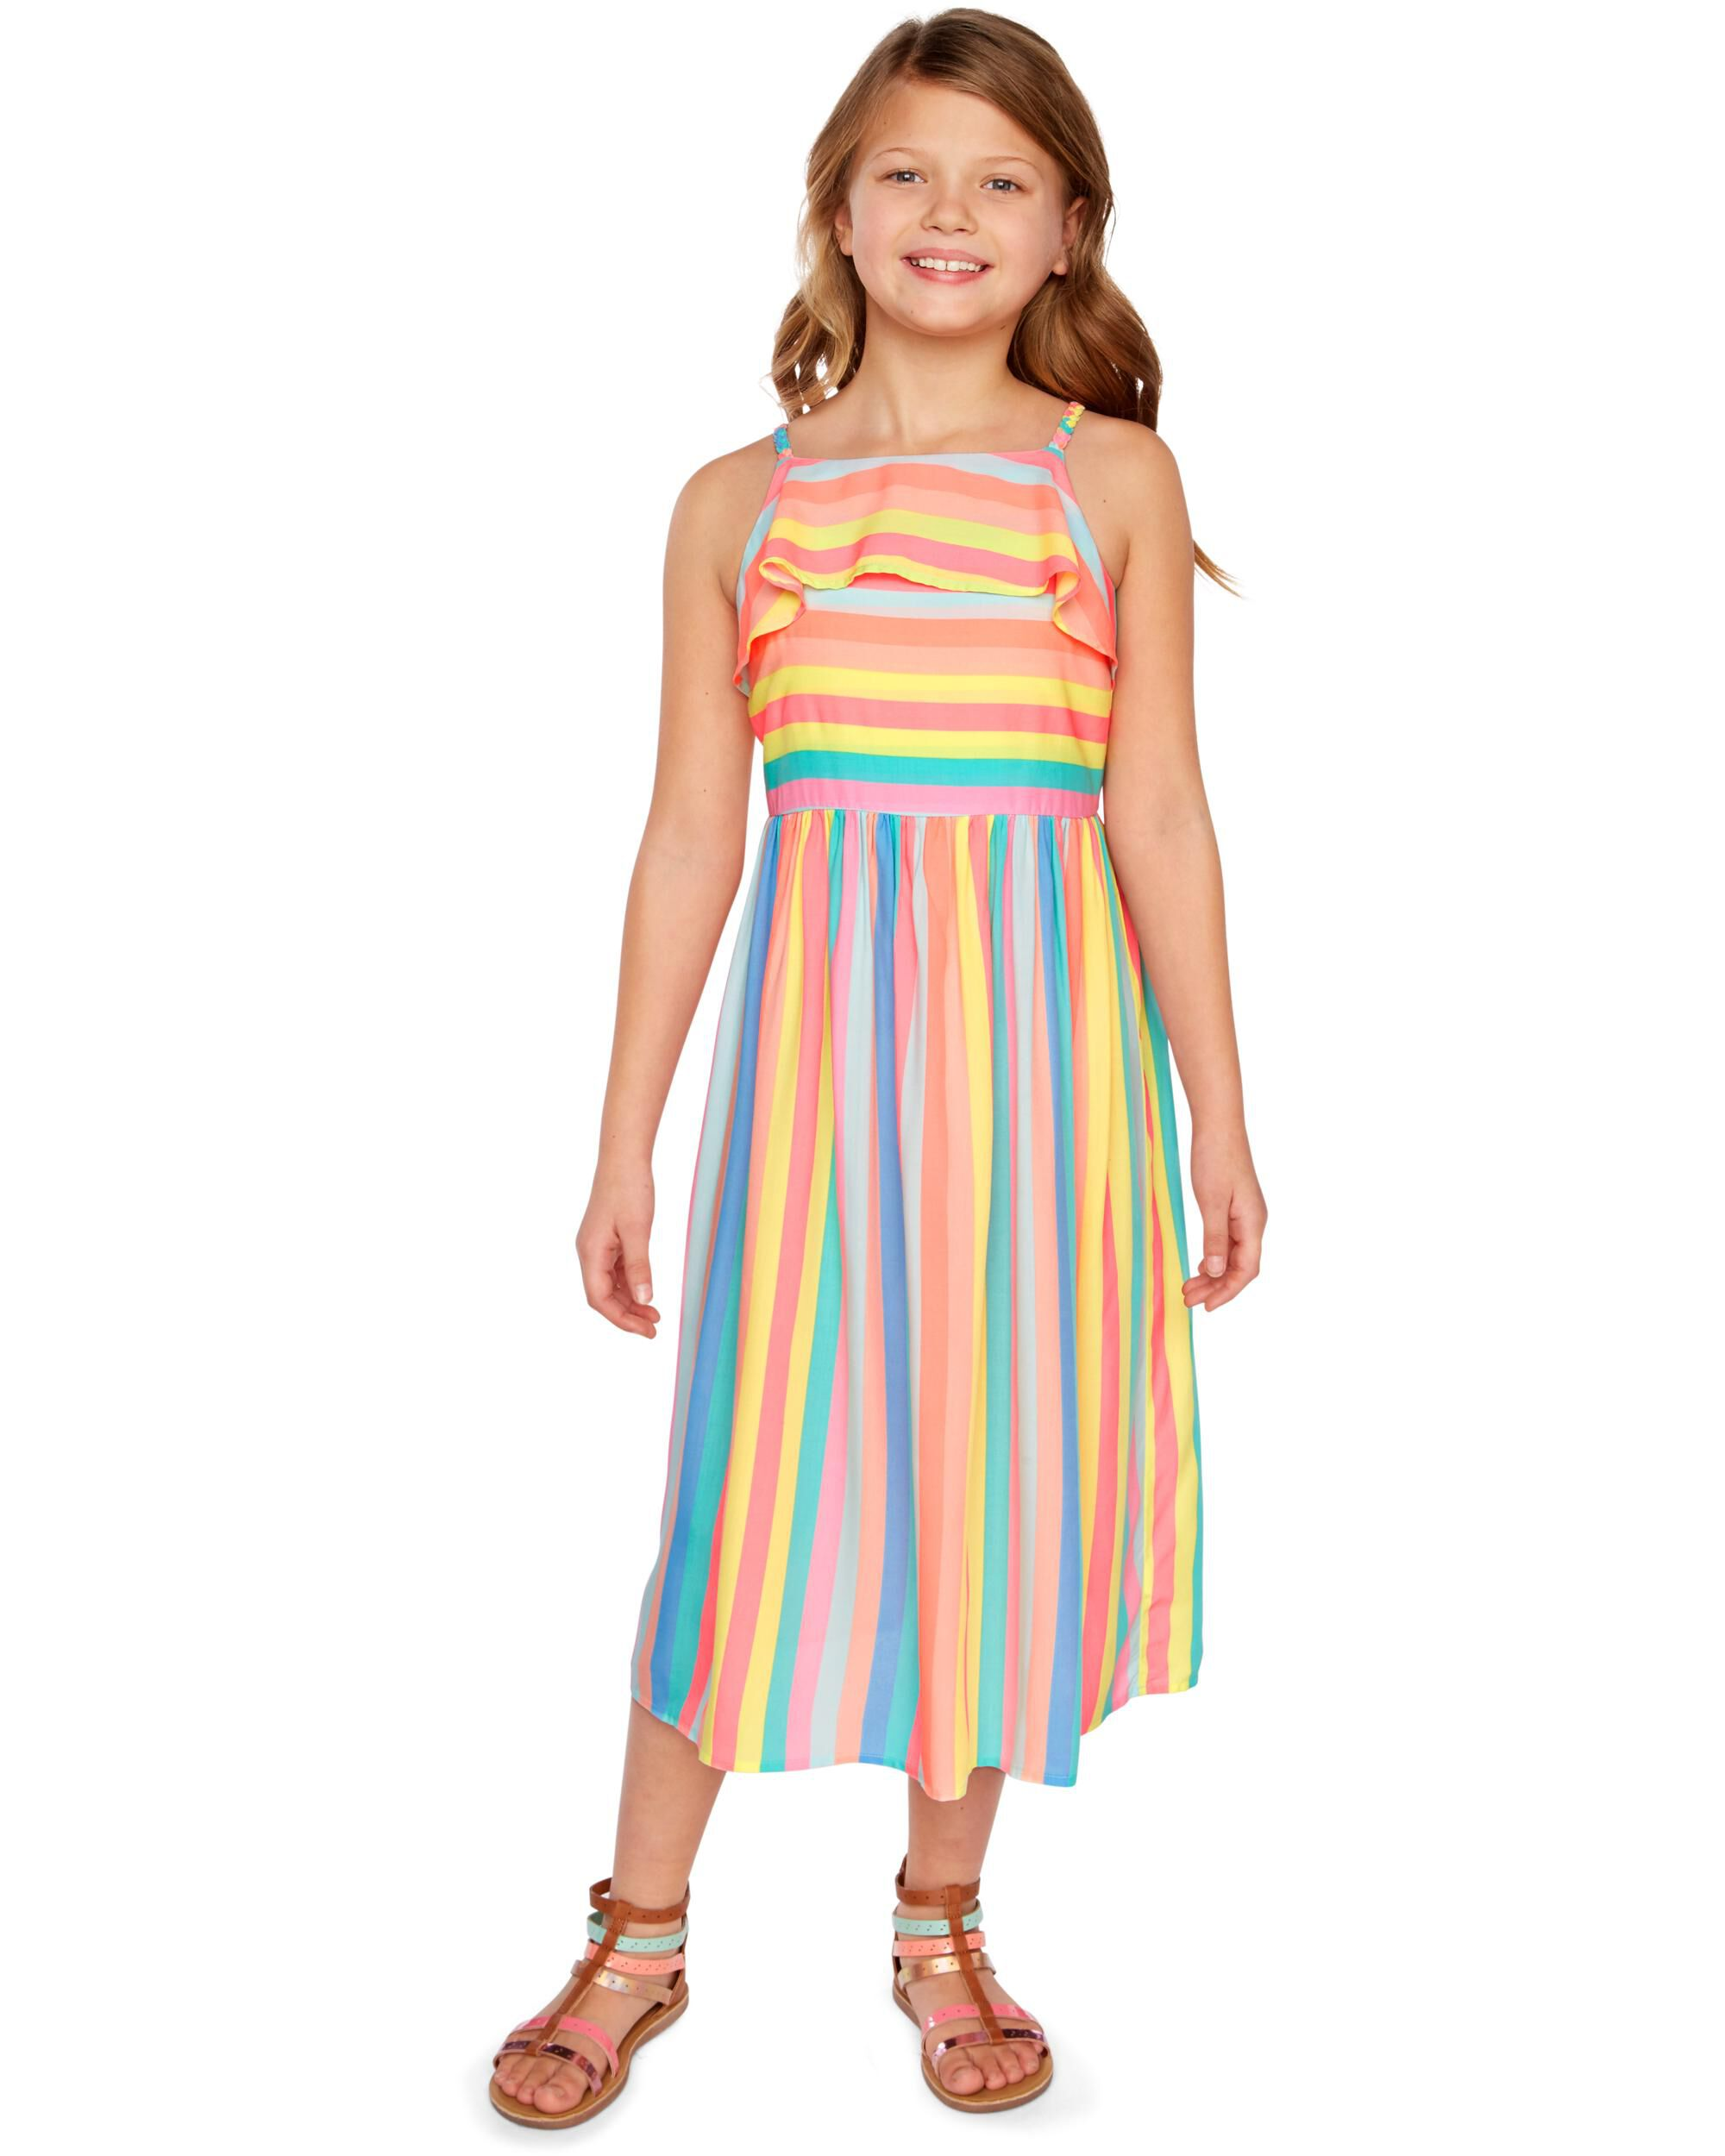 barely Worn Age 4 Girls Oshkosh Summer Dress